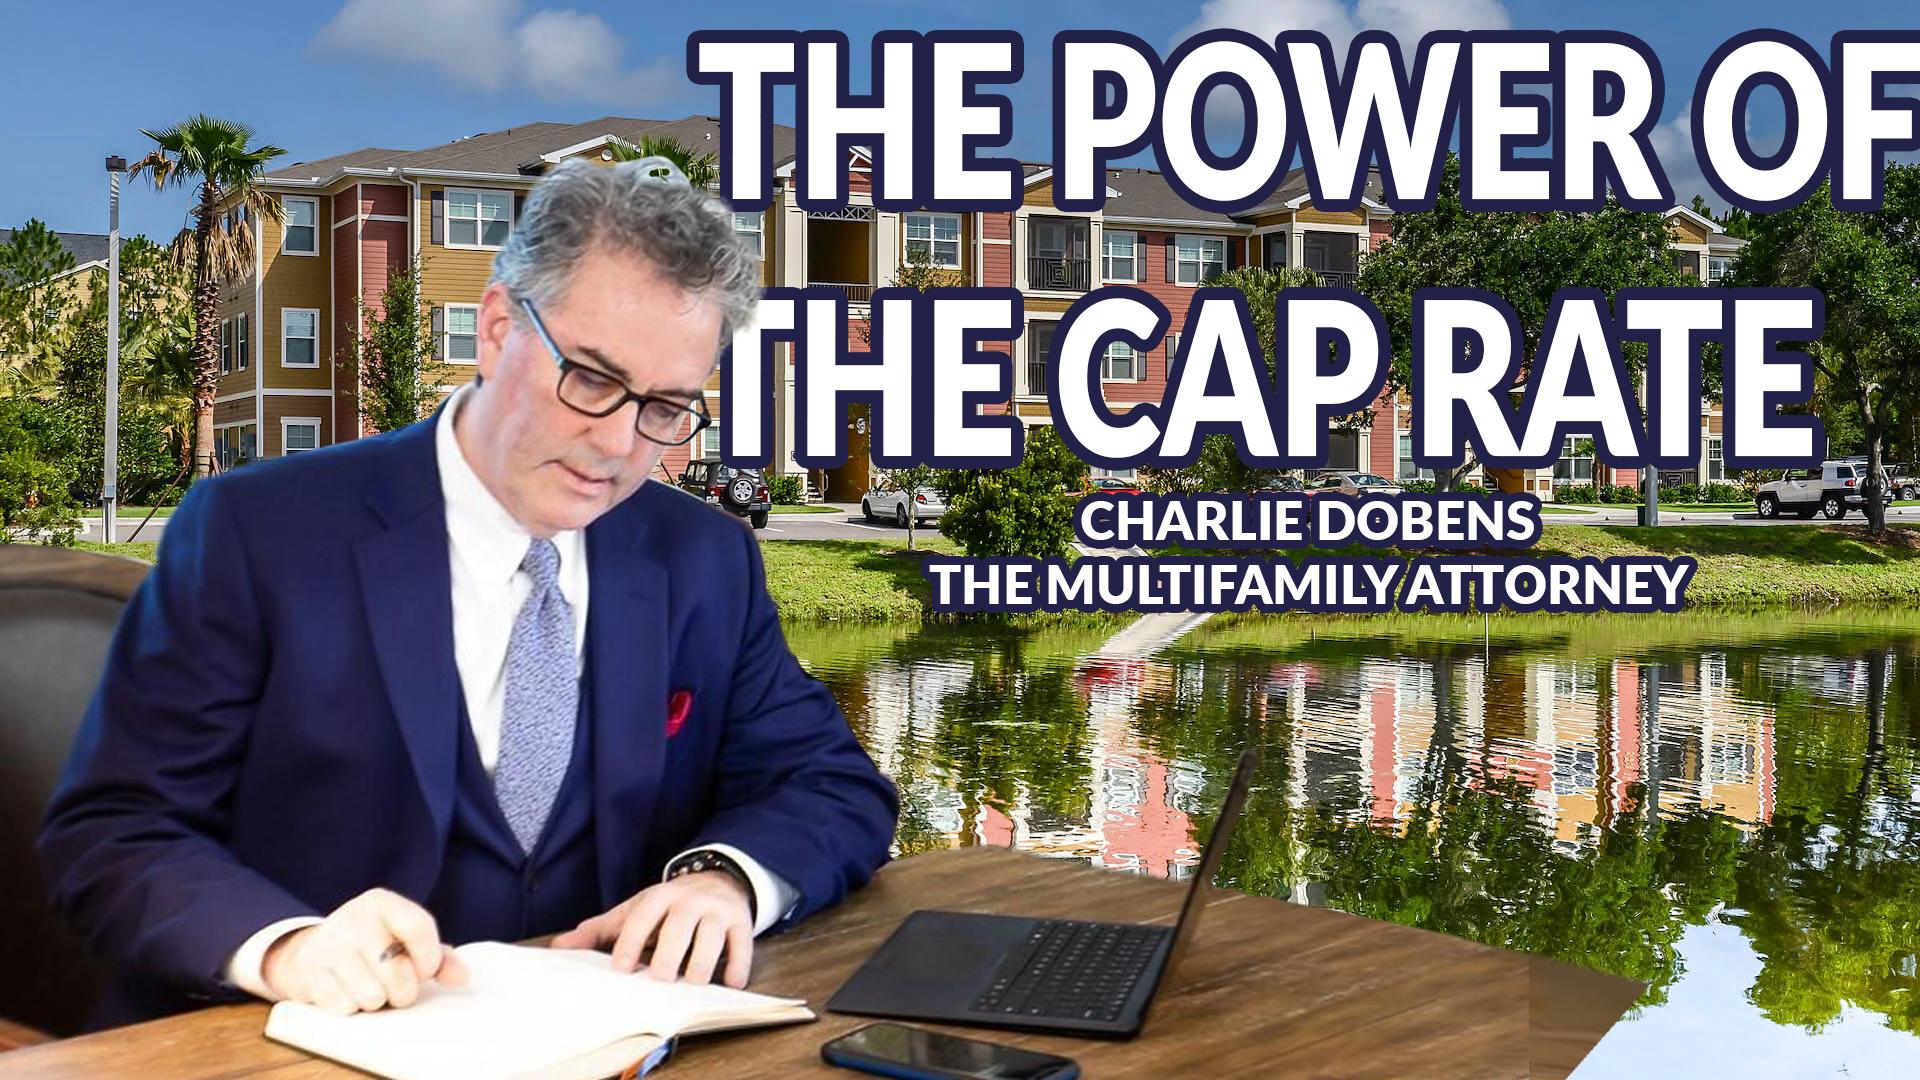 164. Charles Dobens The Multifamily Attorney & Investor